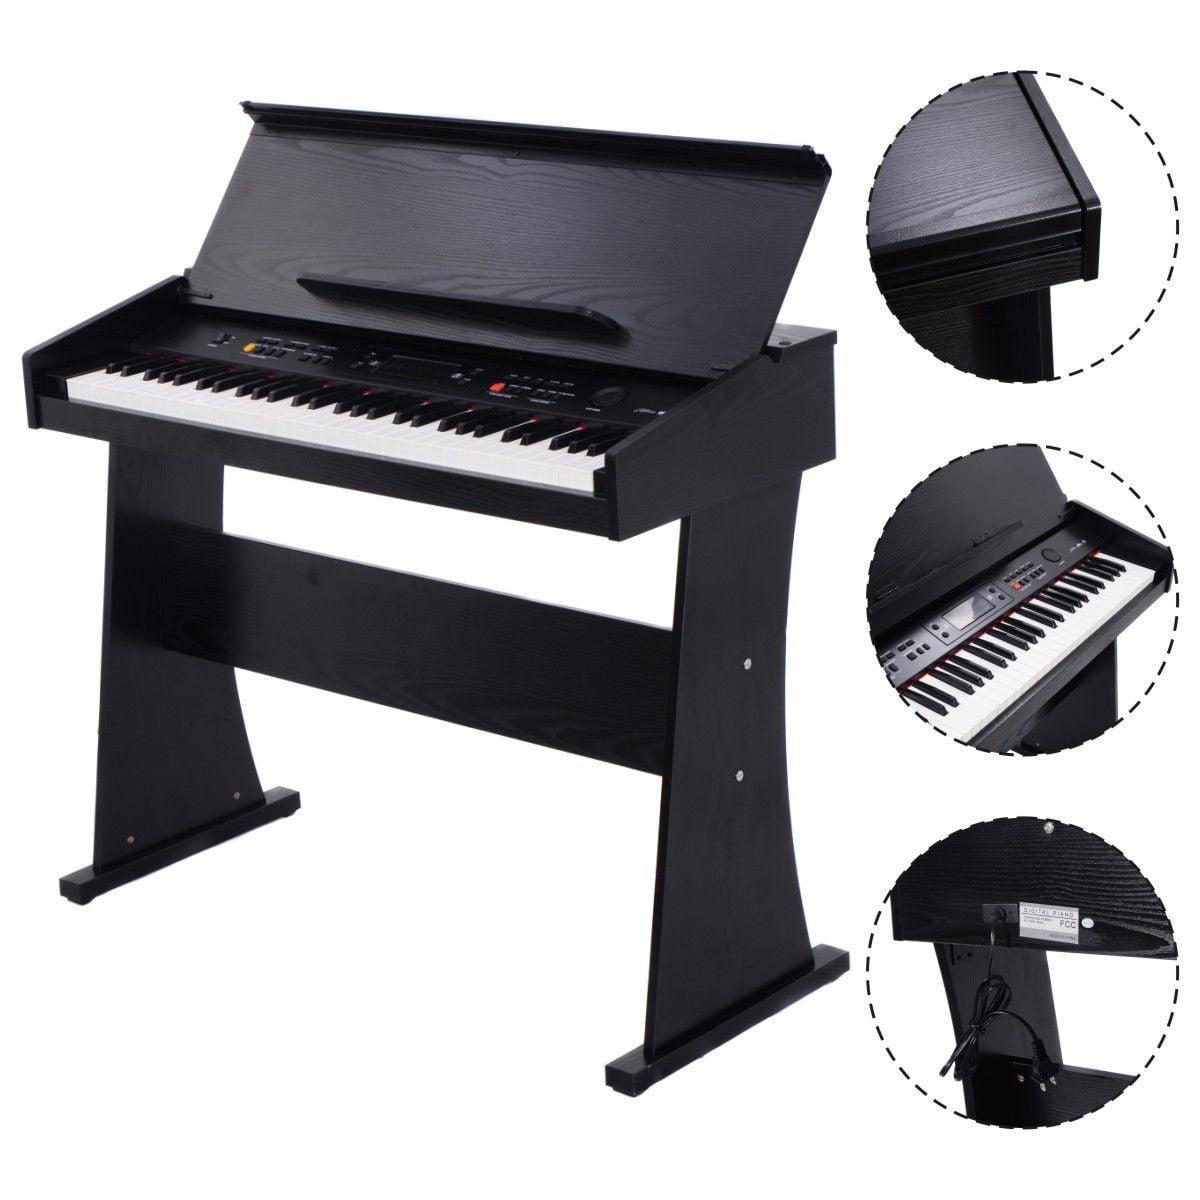 Costway 61 Key Electronic Piano Keyboard Music Multifunctional Digital LED Display by Costway